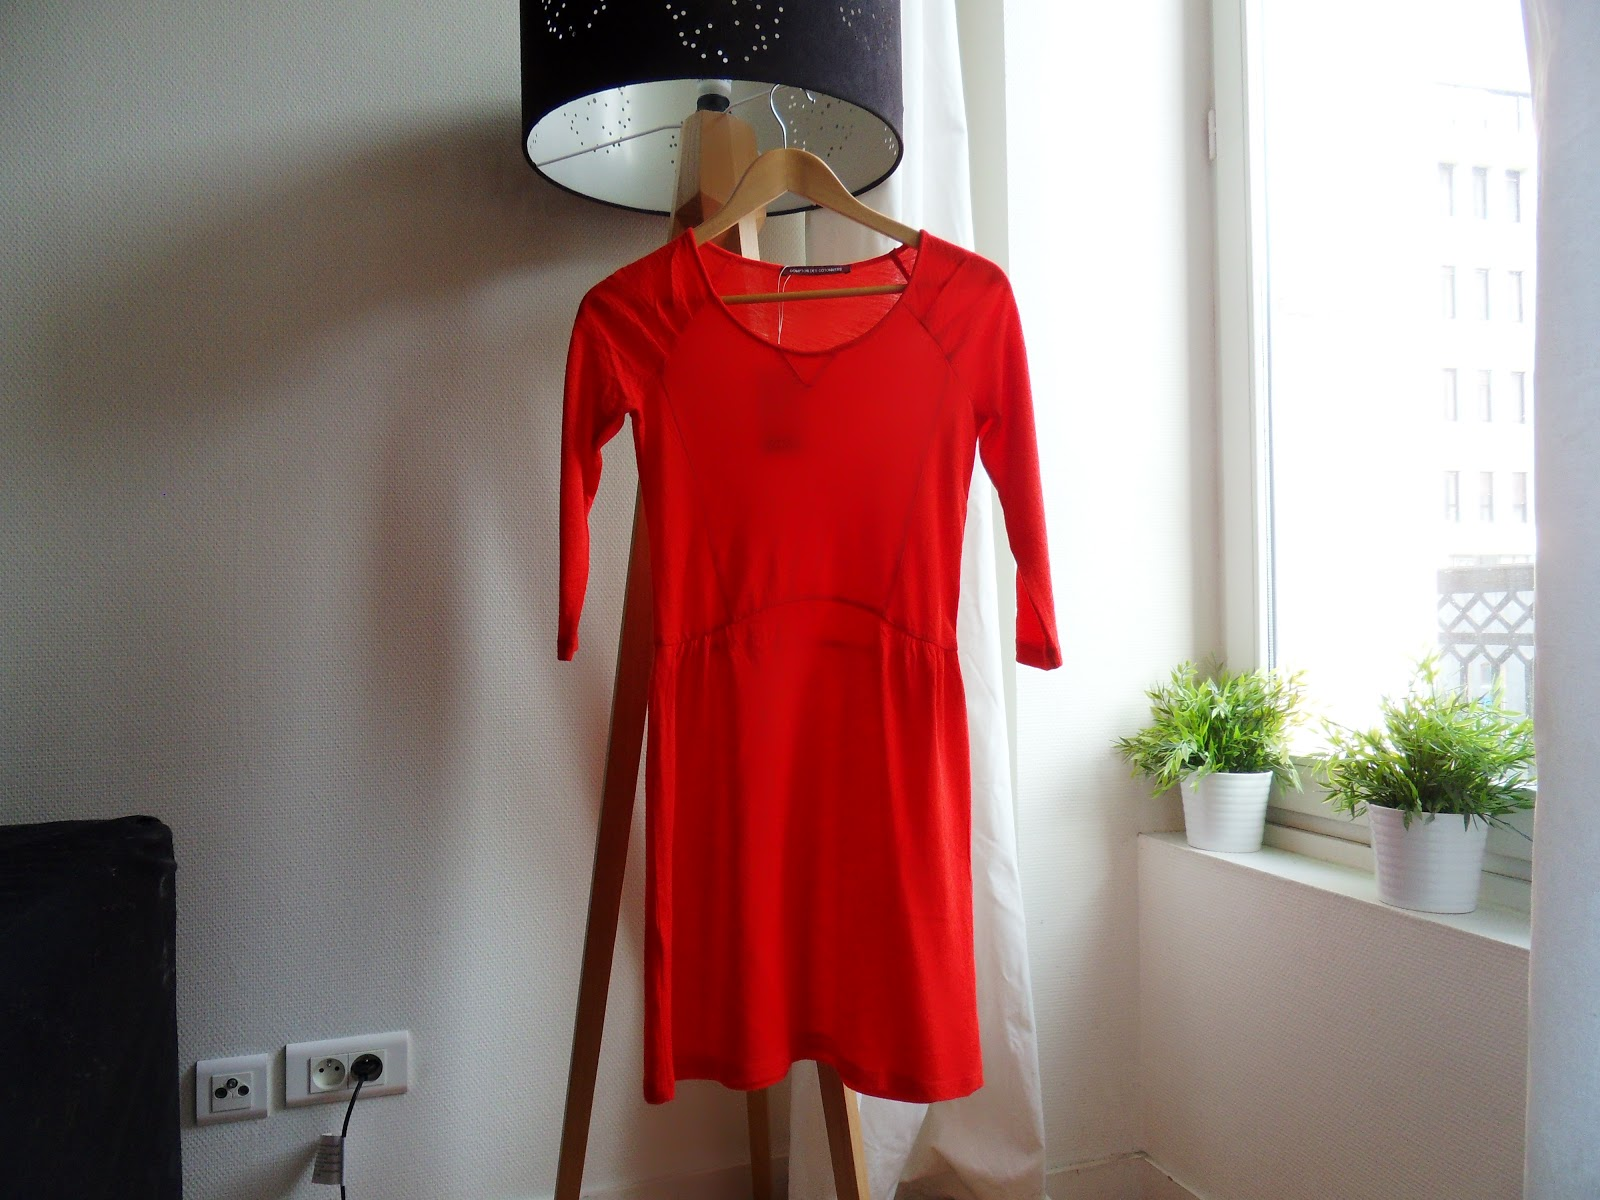 Vide dressing robe natacha comptoir des cotonniers t xs - Vide dressing comptoir des cotonniers ...